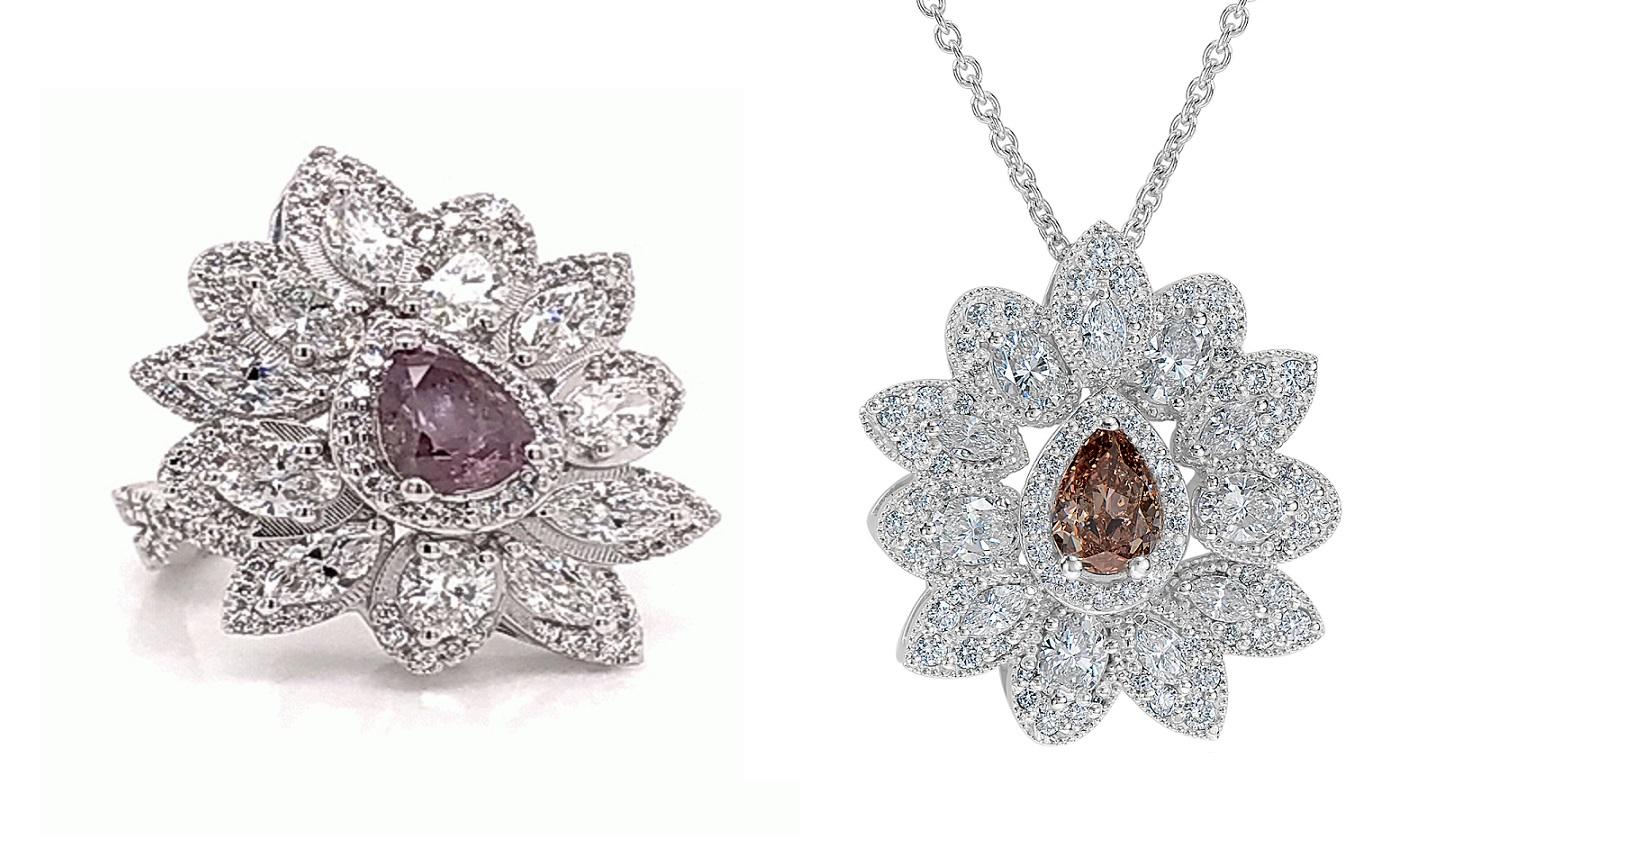 Mixed Pink Diamond Ring & Pendant Set (6.76ct TW)